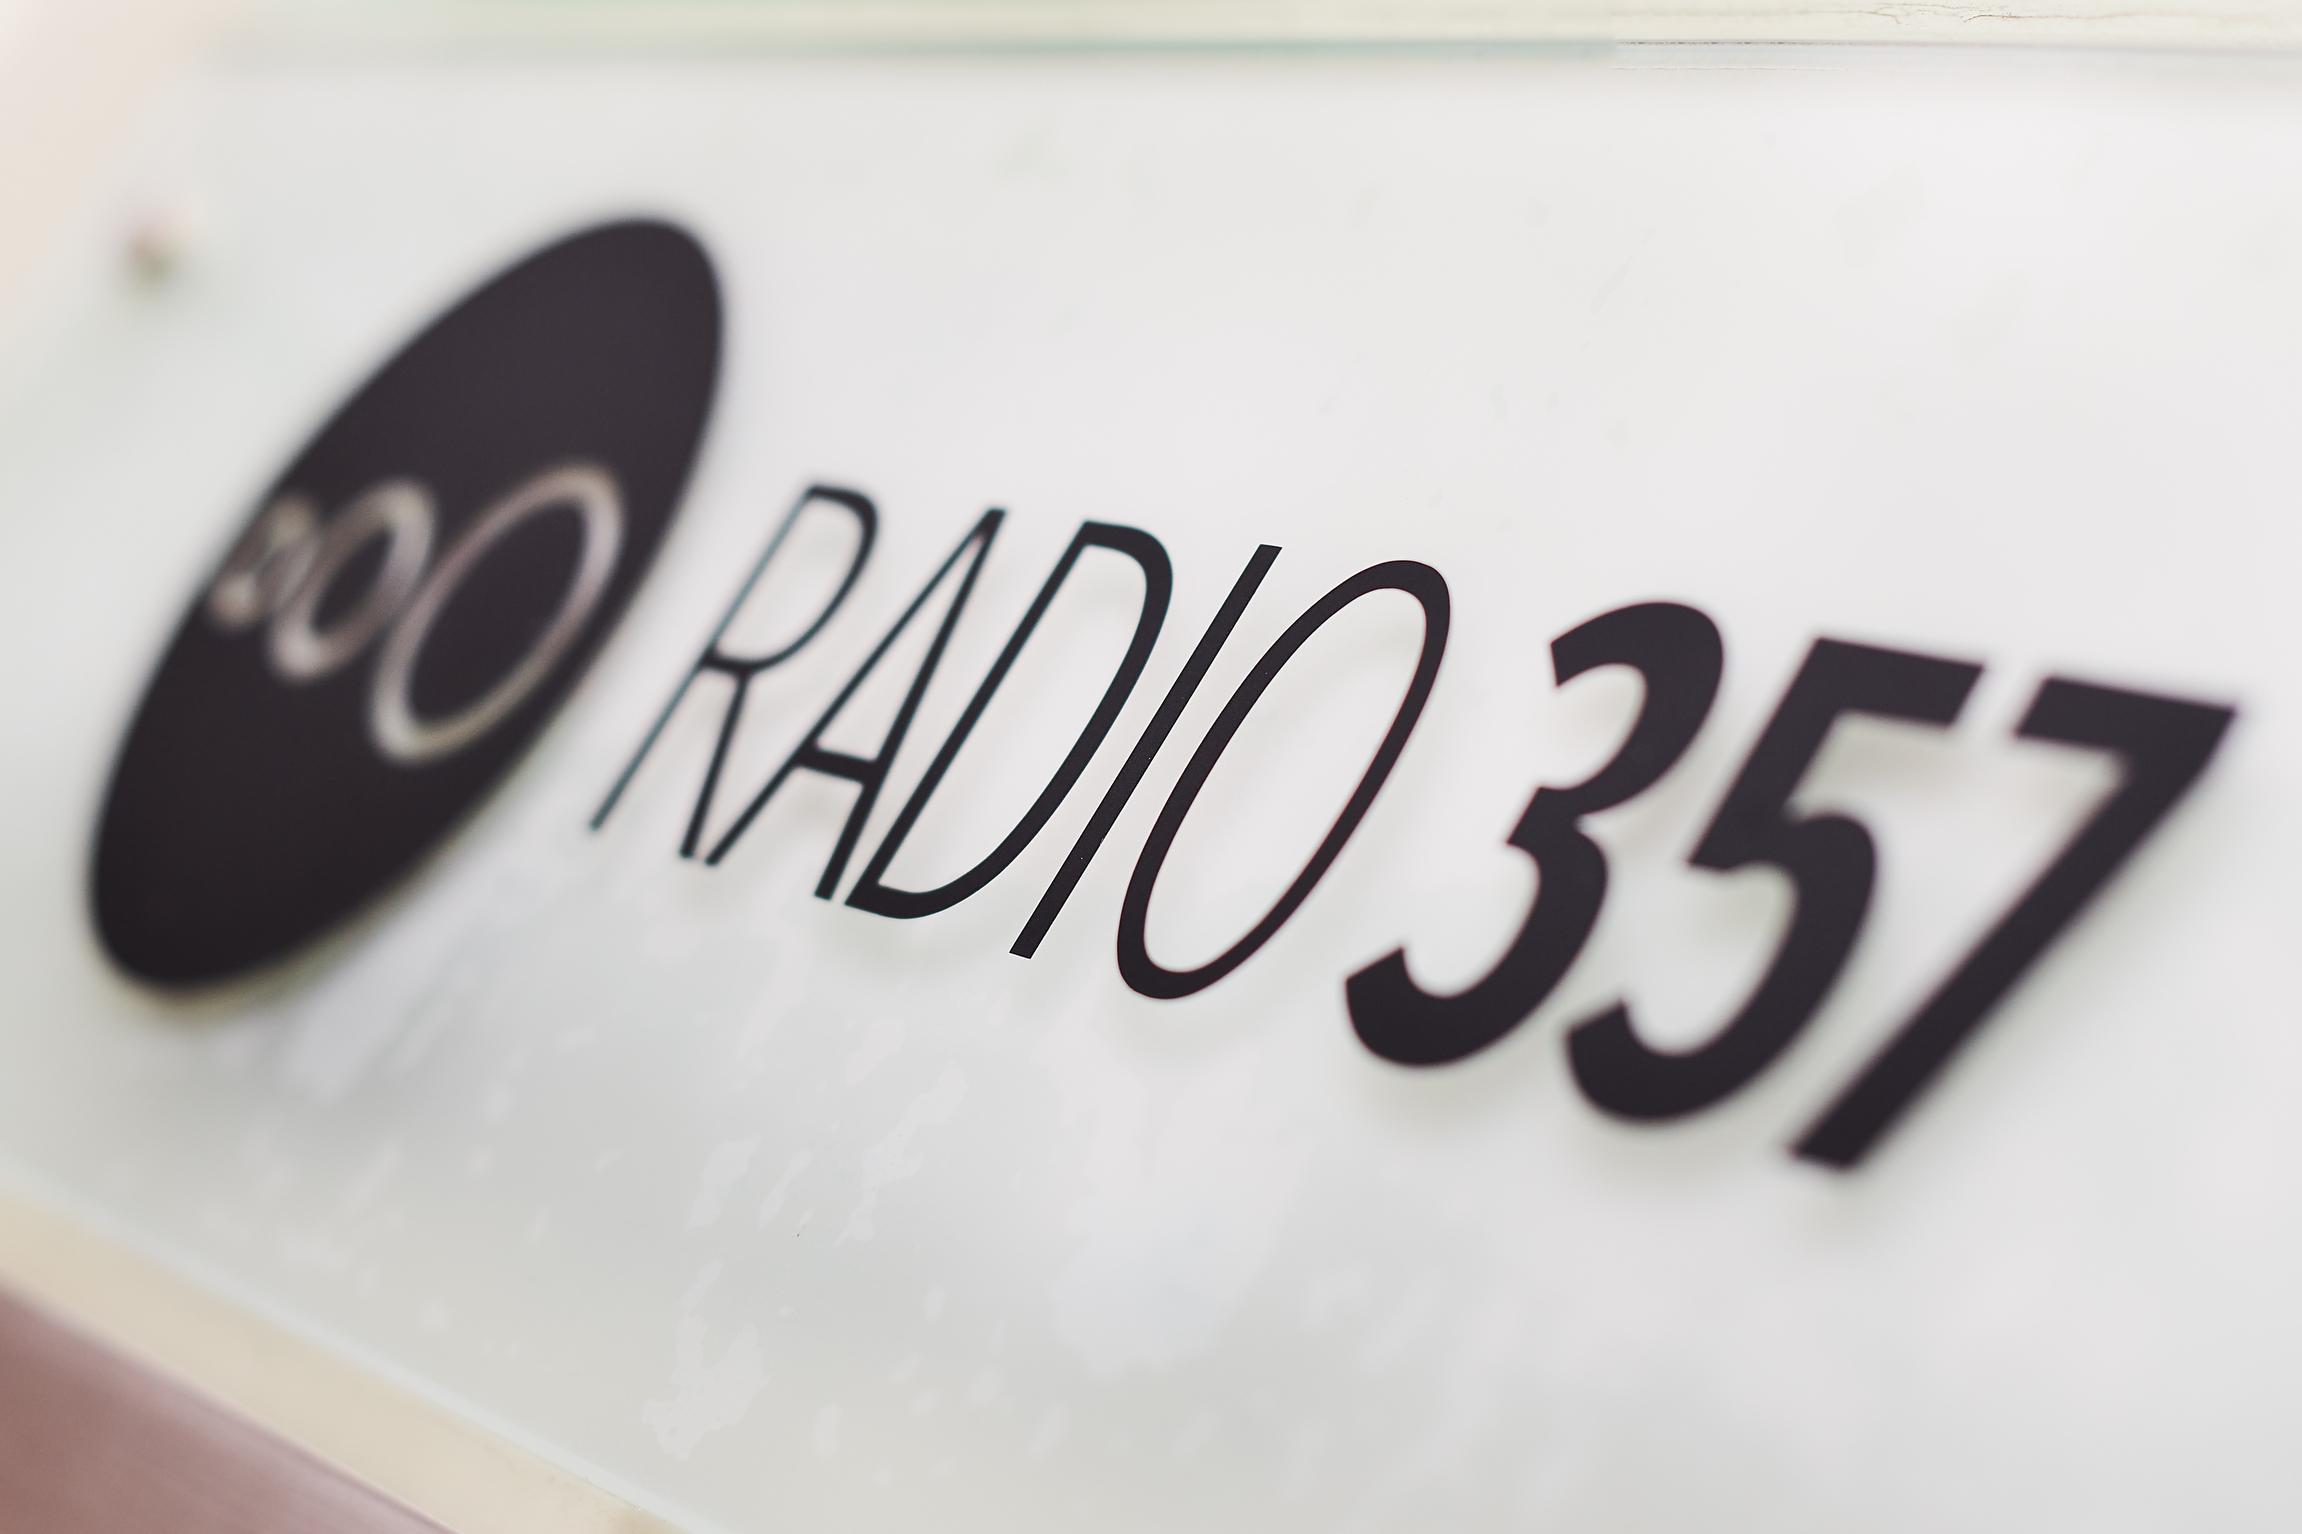 Start Radia 357